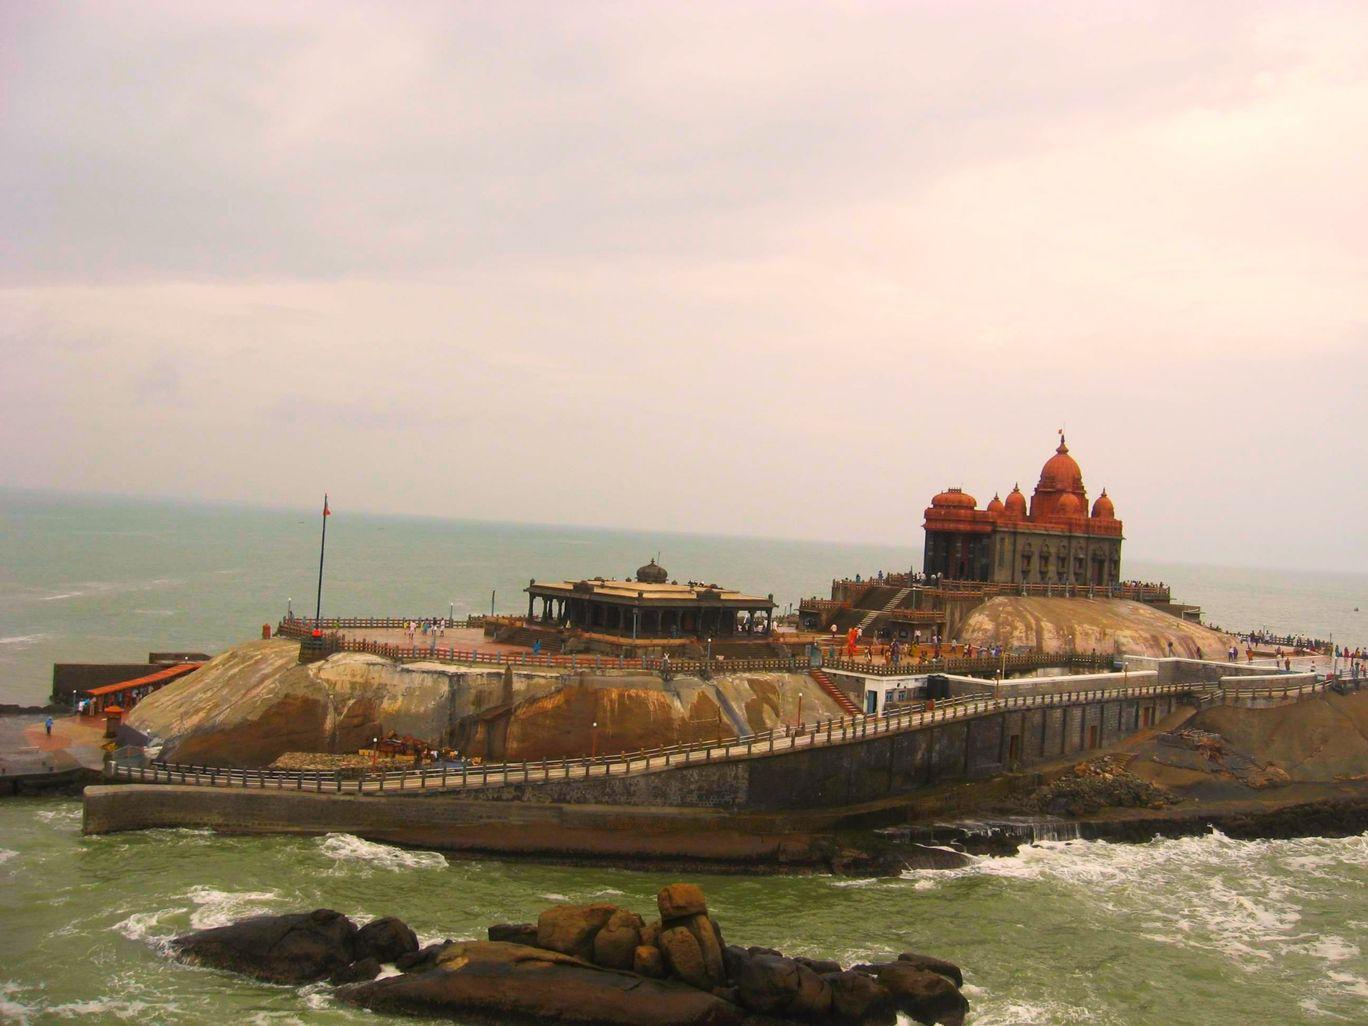 Photo of Vivekananda Rock Memorial By Mazzanilife